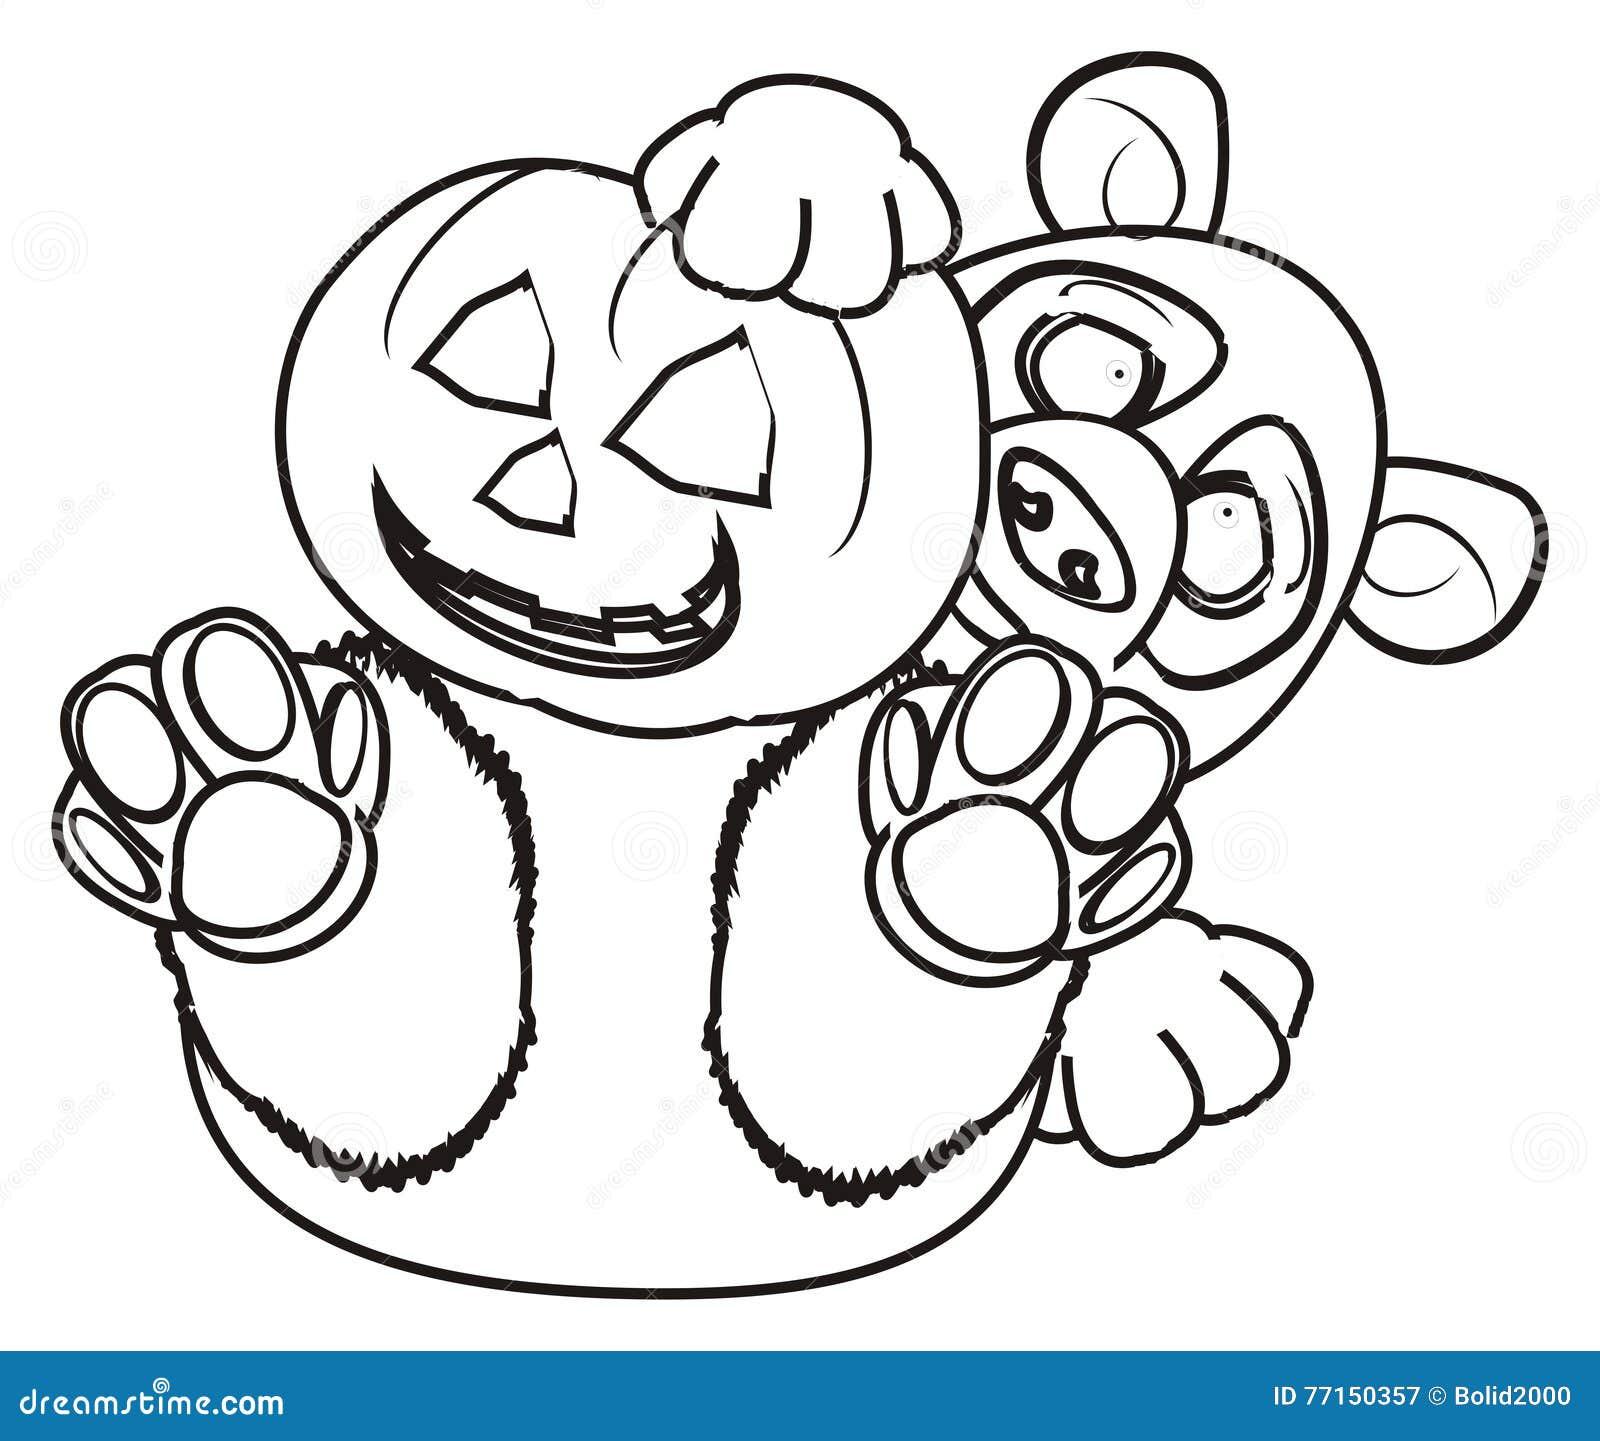 Coloring Panda Hold A Pumpkin Stock Illustration - Illustration of ...